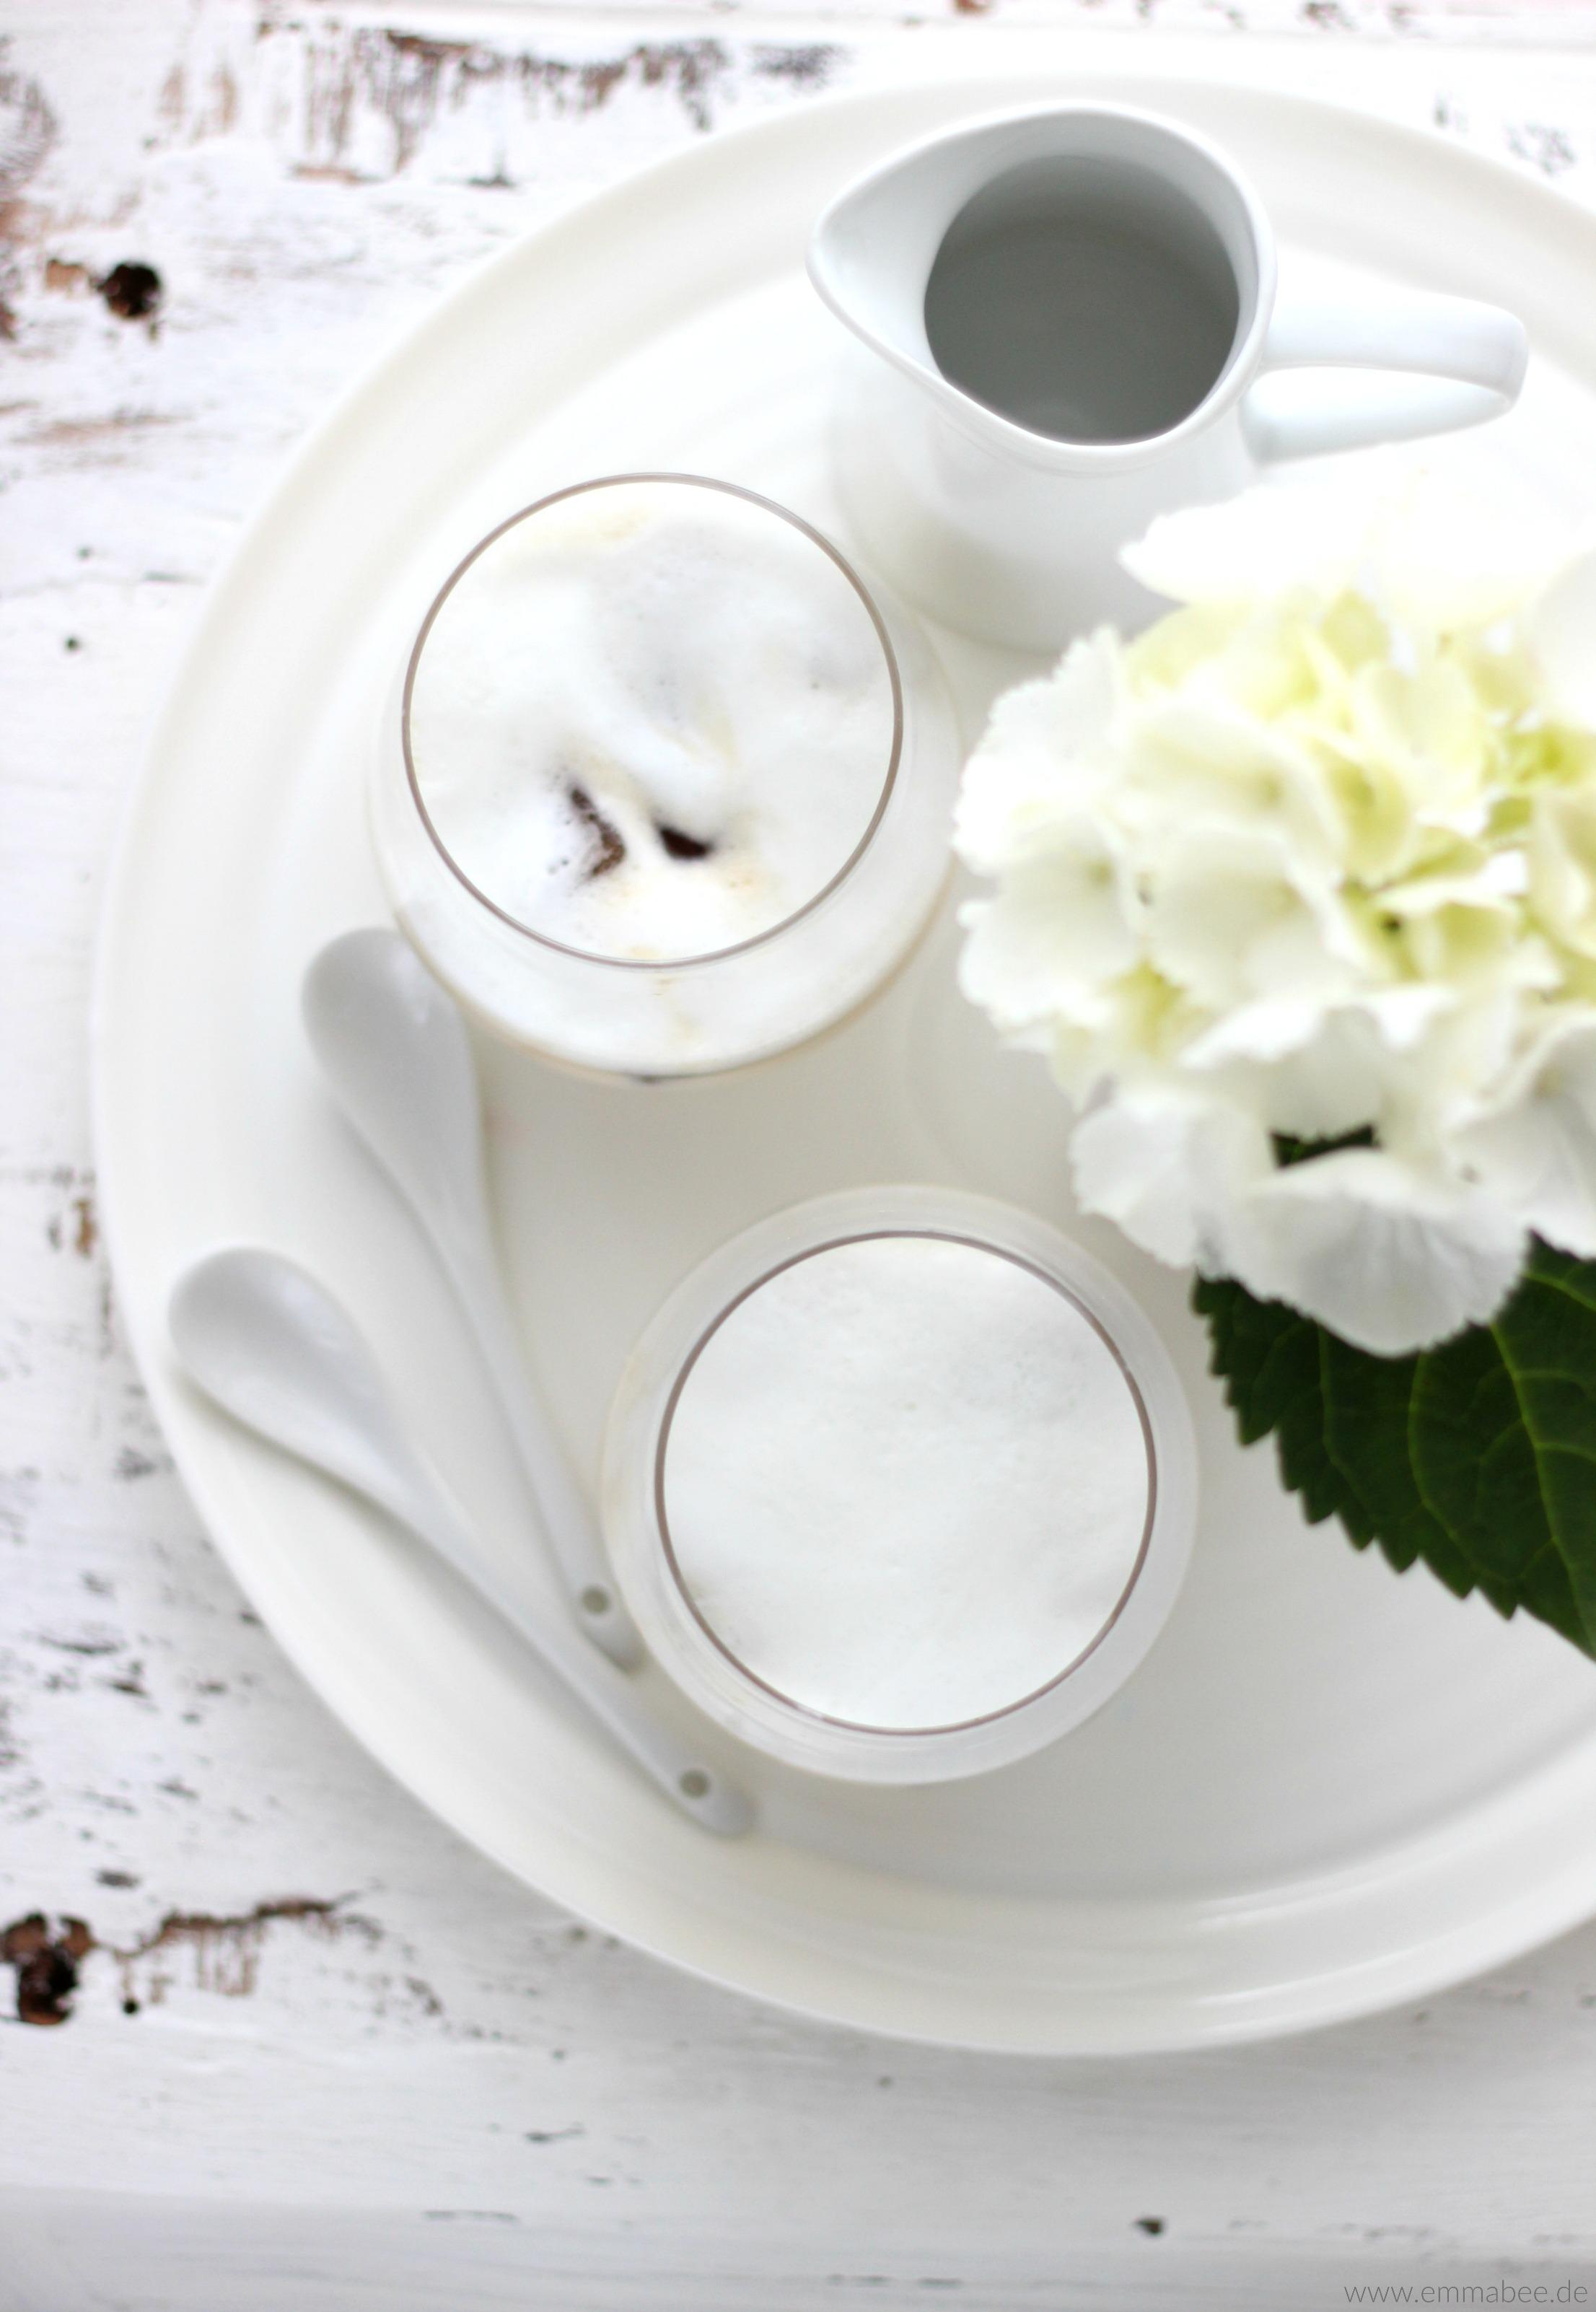 rezept total verknallt in diesen eiskaffee emma bee. Black Bedroom Furniture Sets. Home Design Ideas